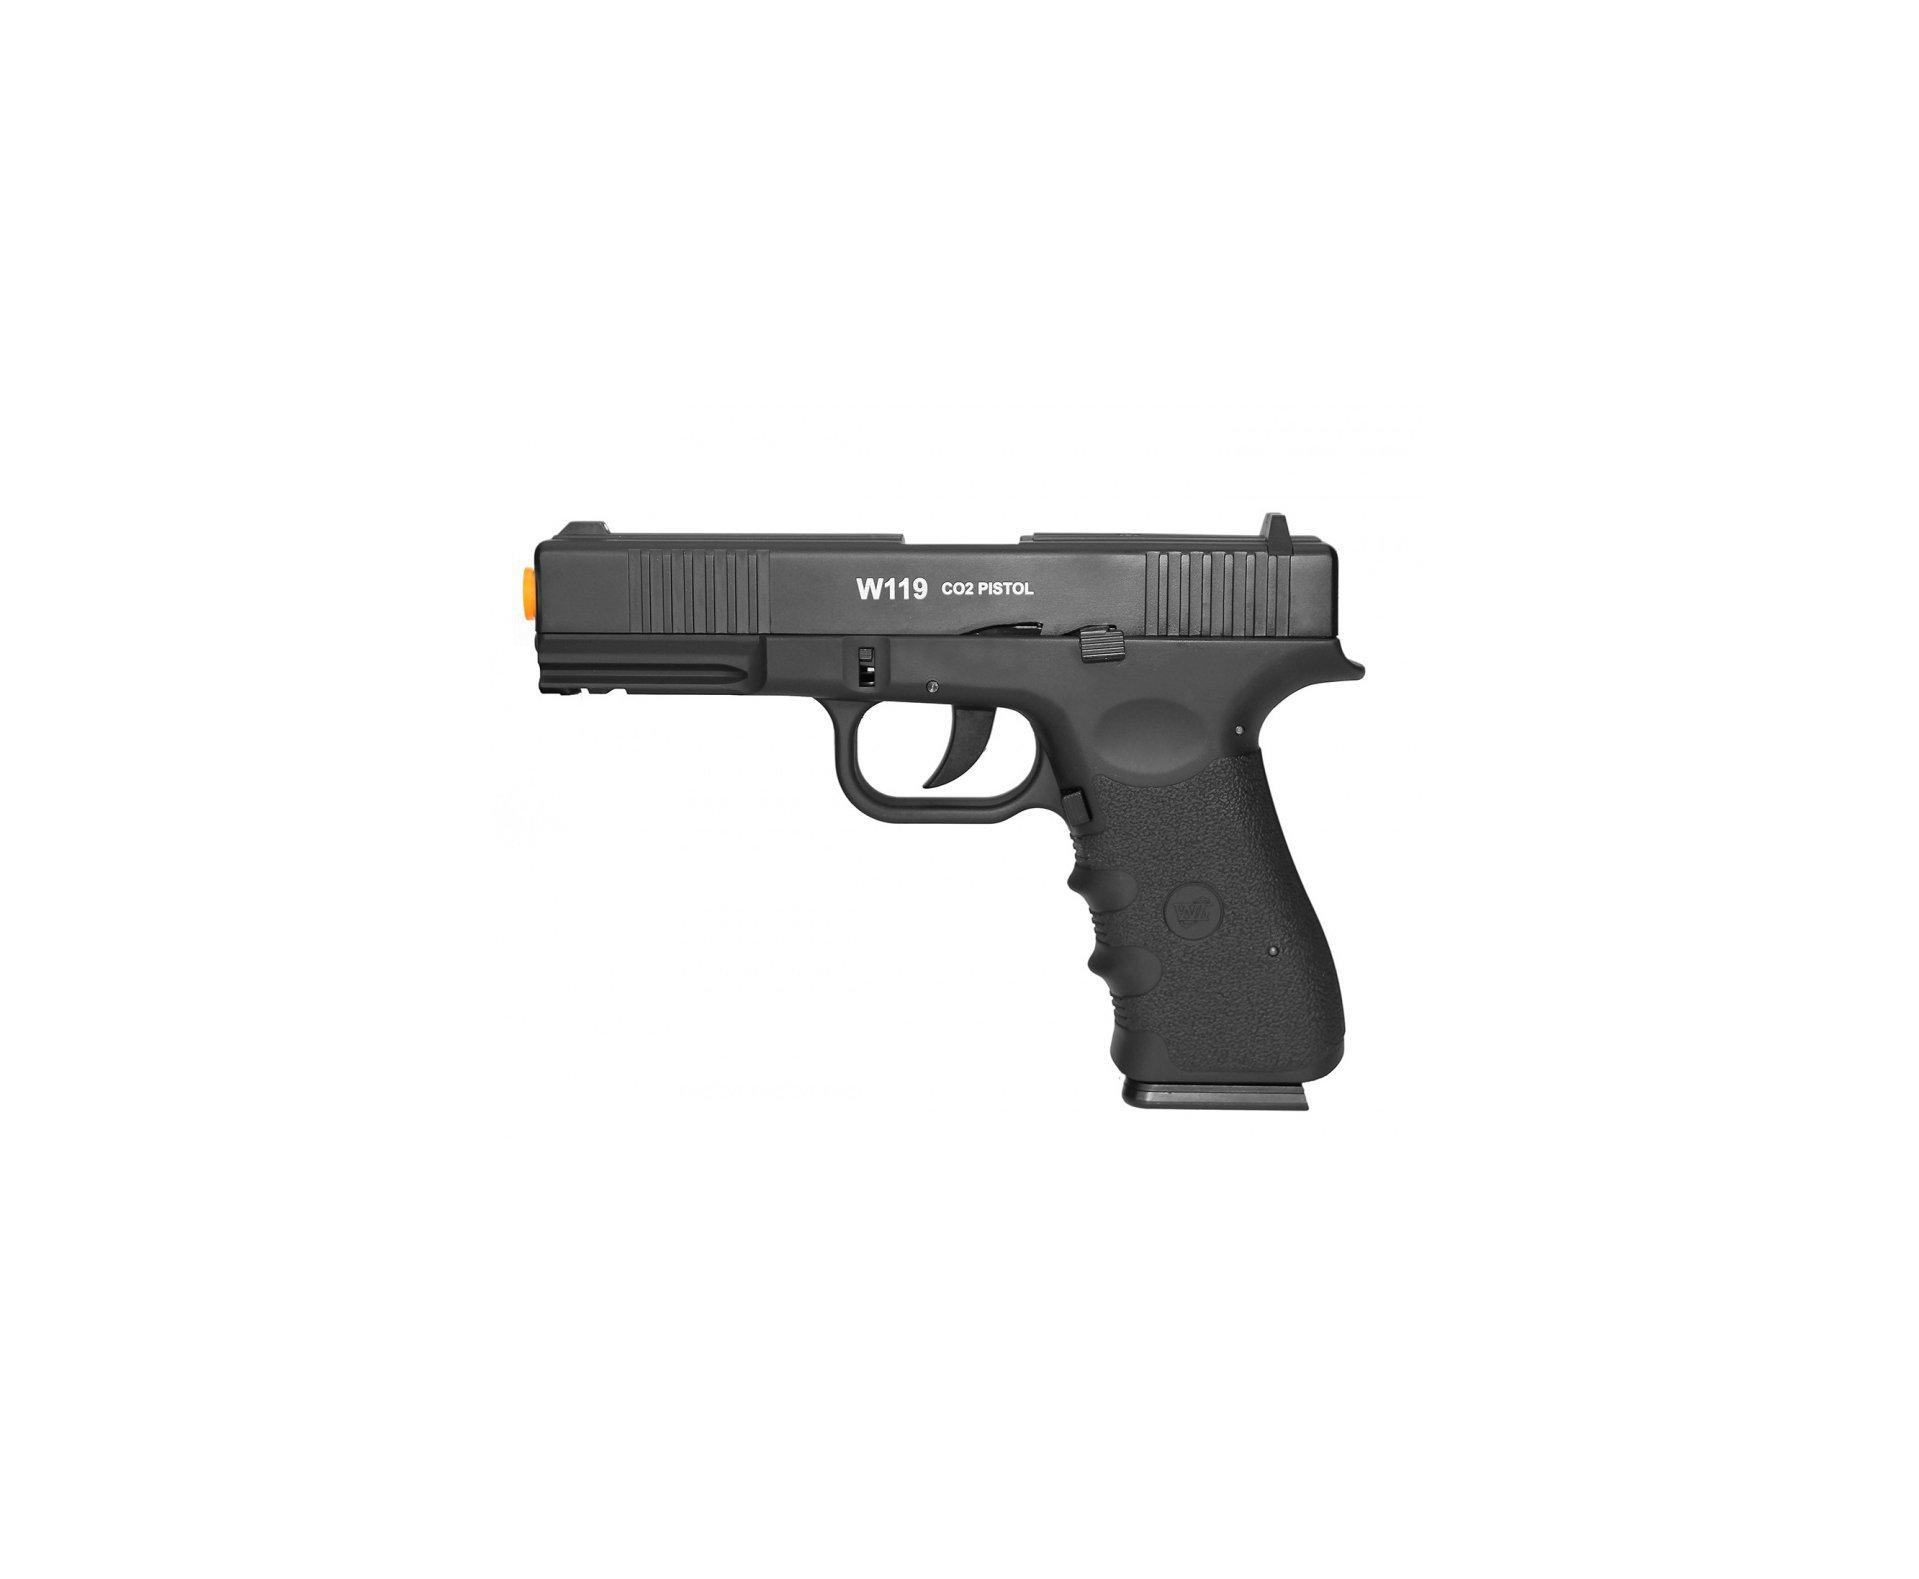 Pistola De Airsoft Gas Co2 Wg Glock W119 Slide Metal Blowback 6.0mm Wingun/rossi